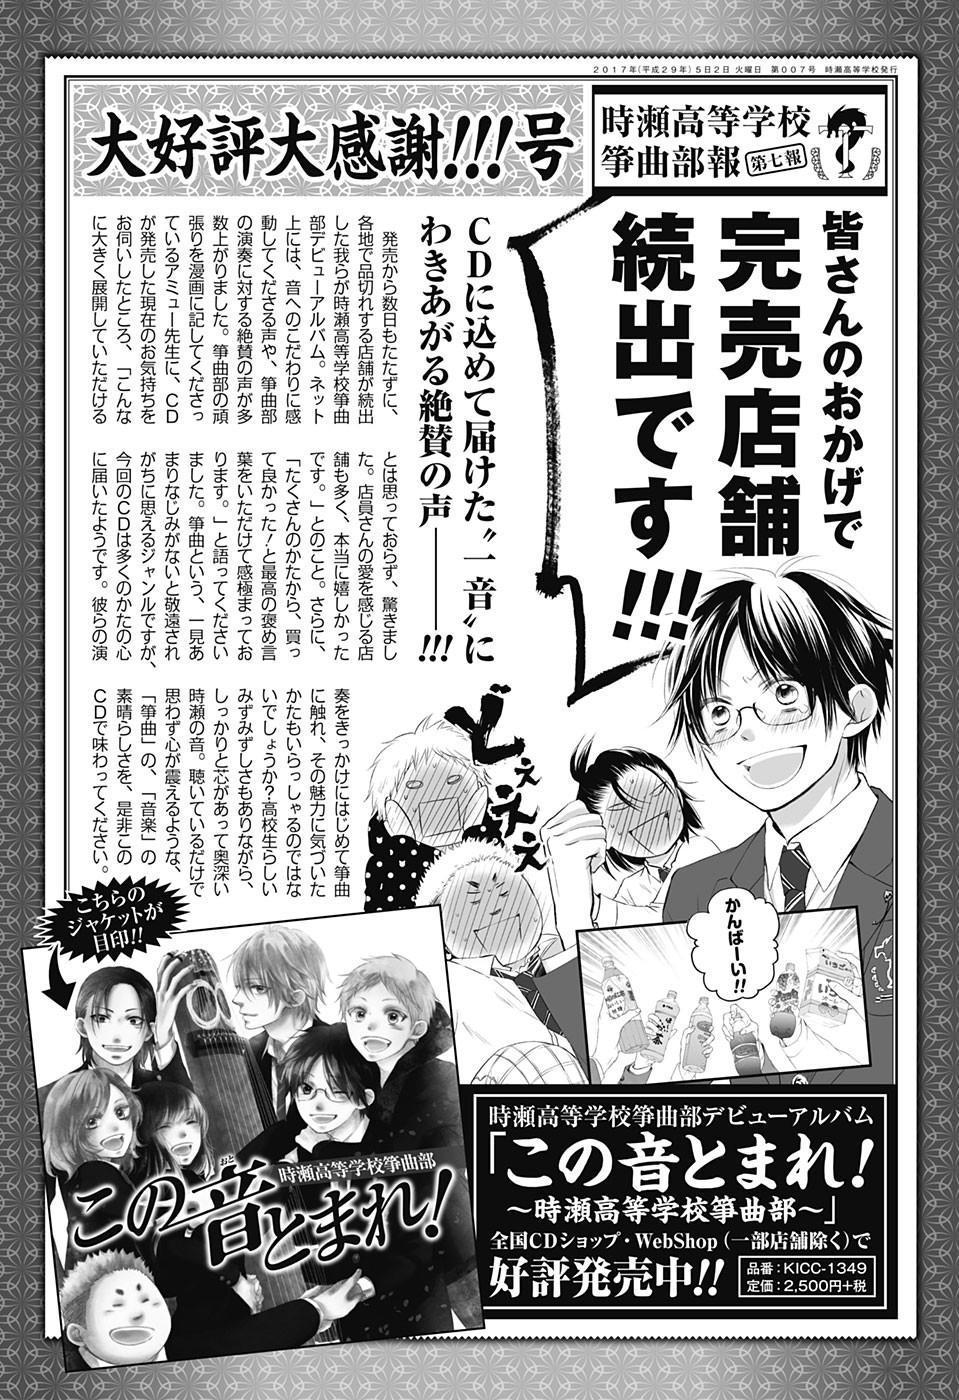 Kono Oto Tomare! - Chapter 58 - Page 1